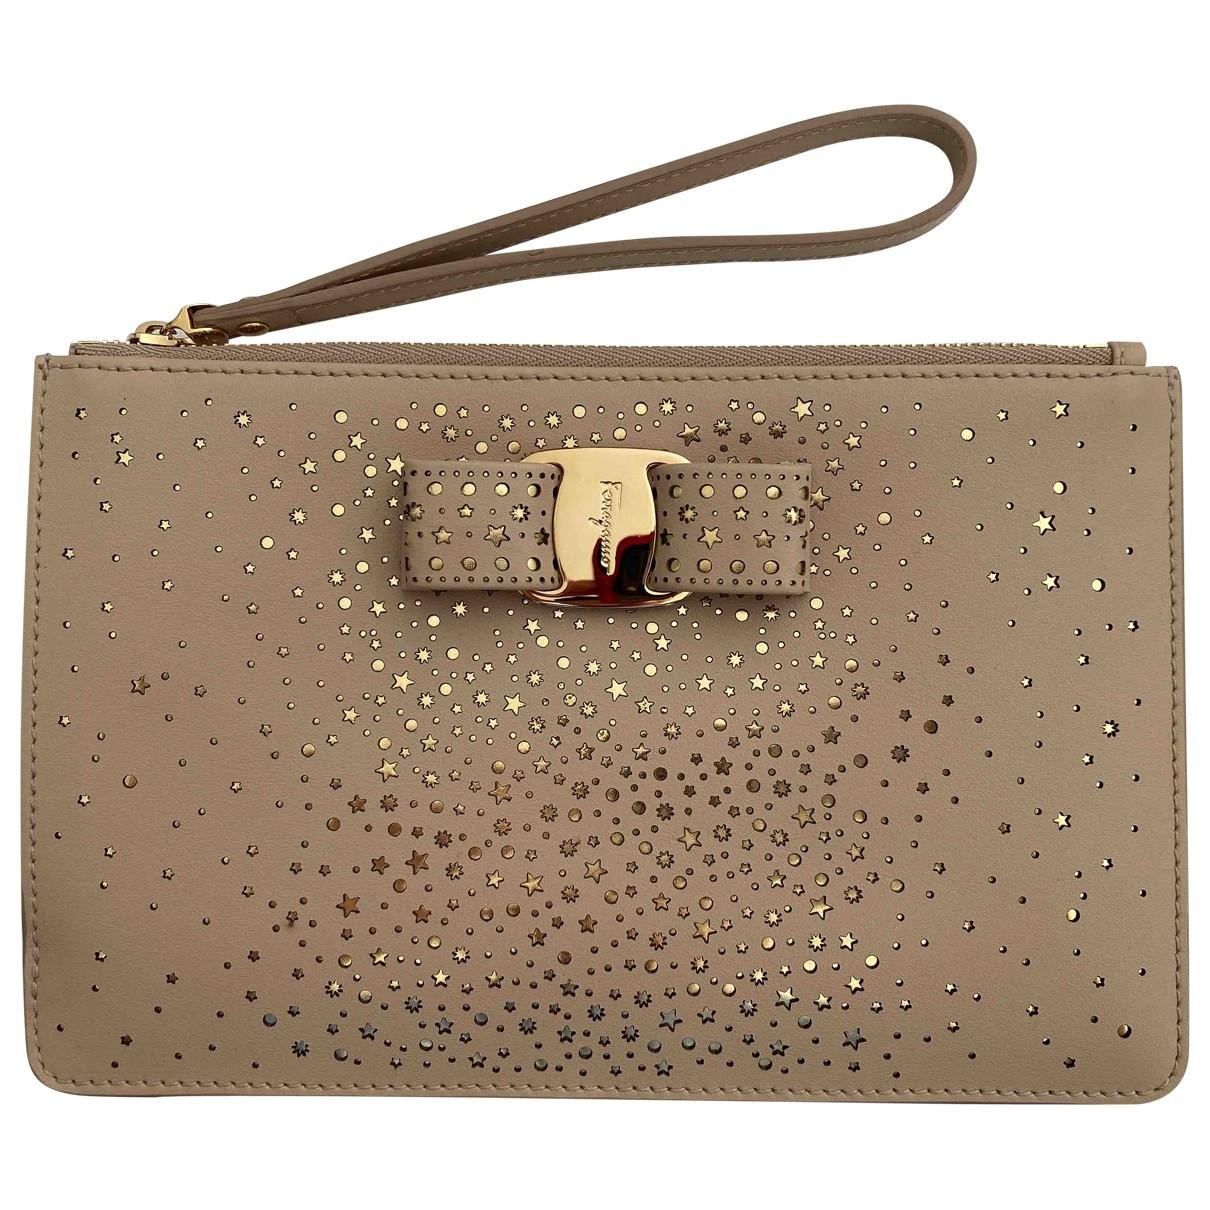 Salvatore Ferragamo \N Beige Leather Purses, wallet & cases for Women \N